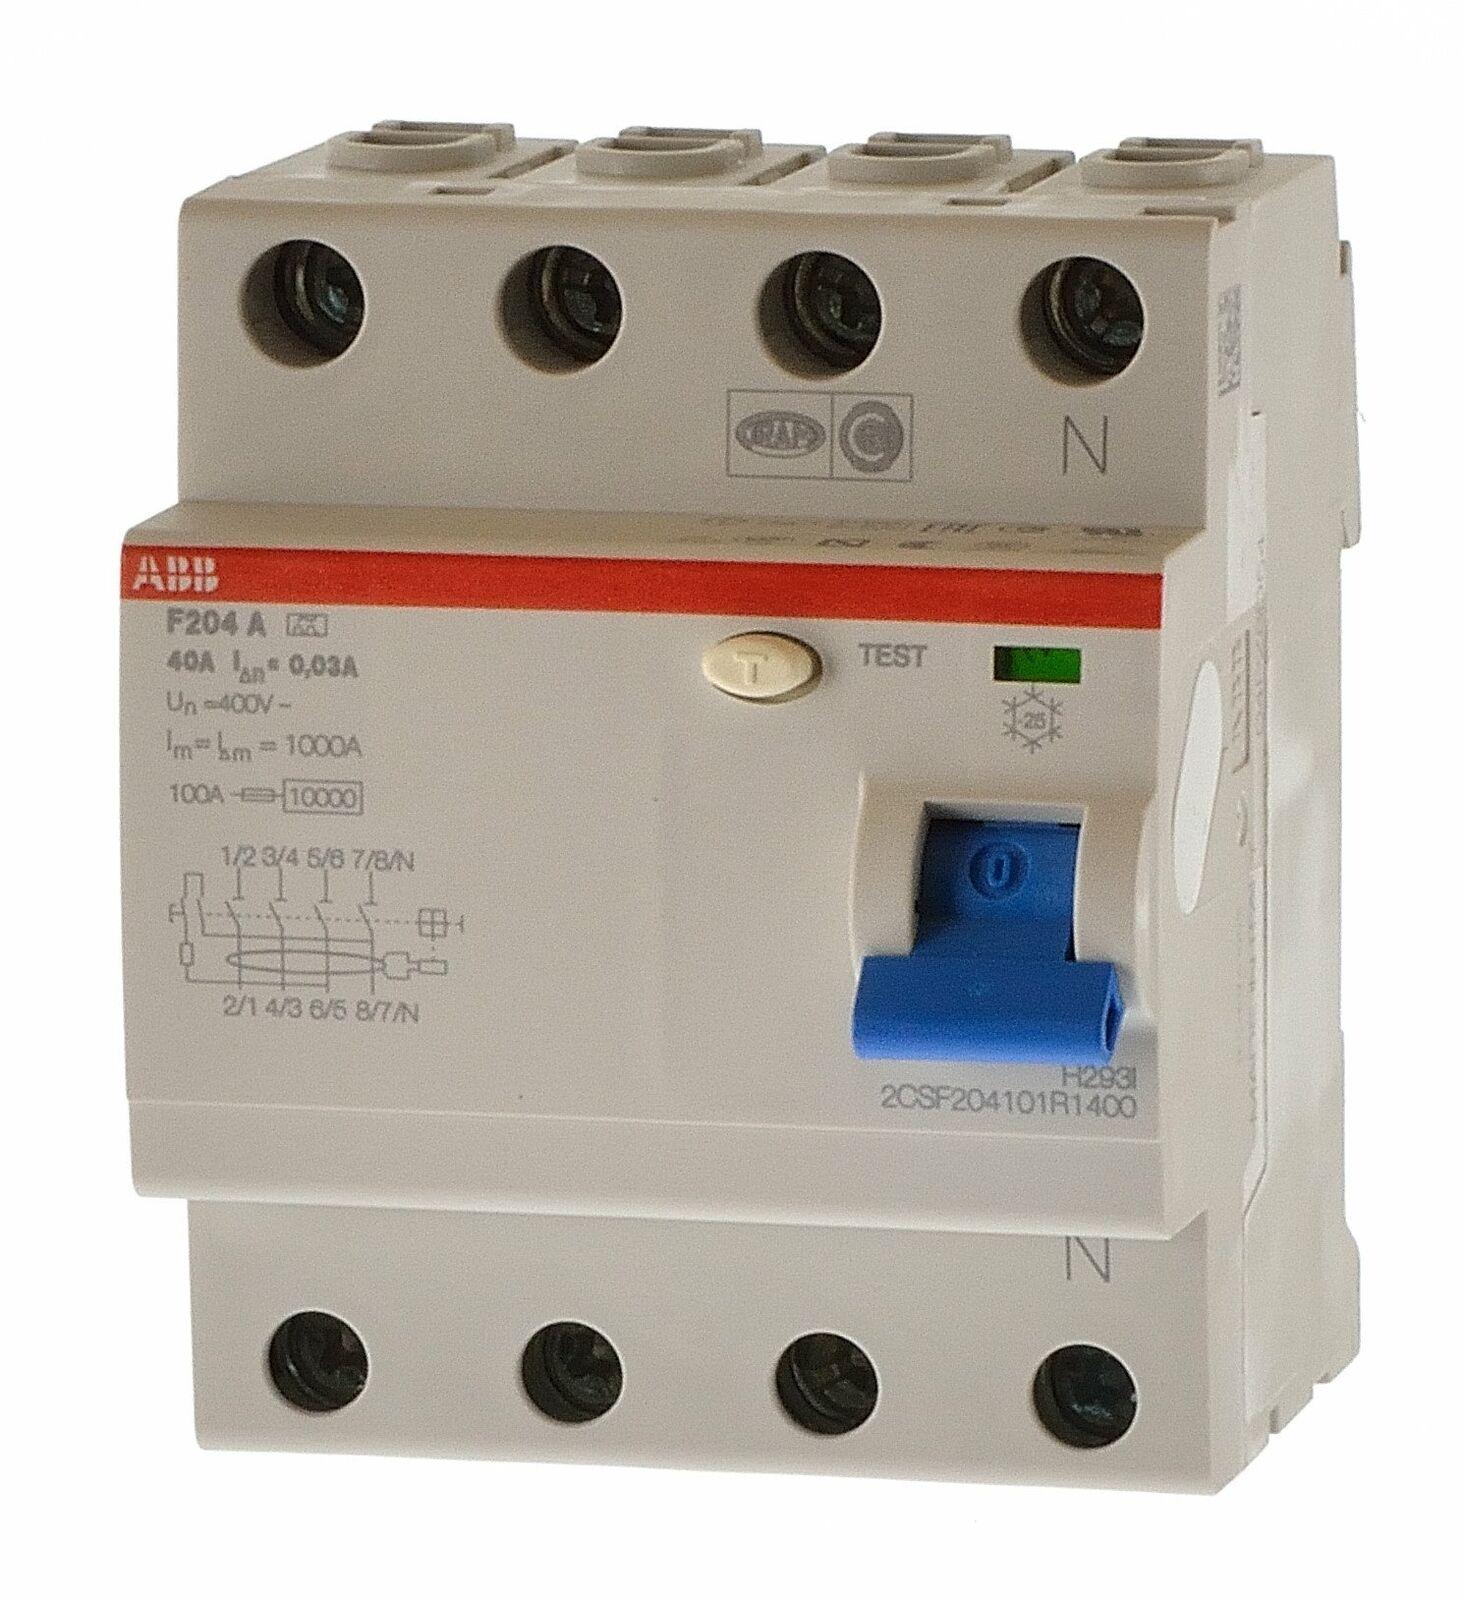 ABB F204 A-63  0,3 Fehlerstromschutzschalter  2CSF204101R3630